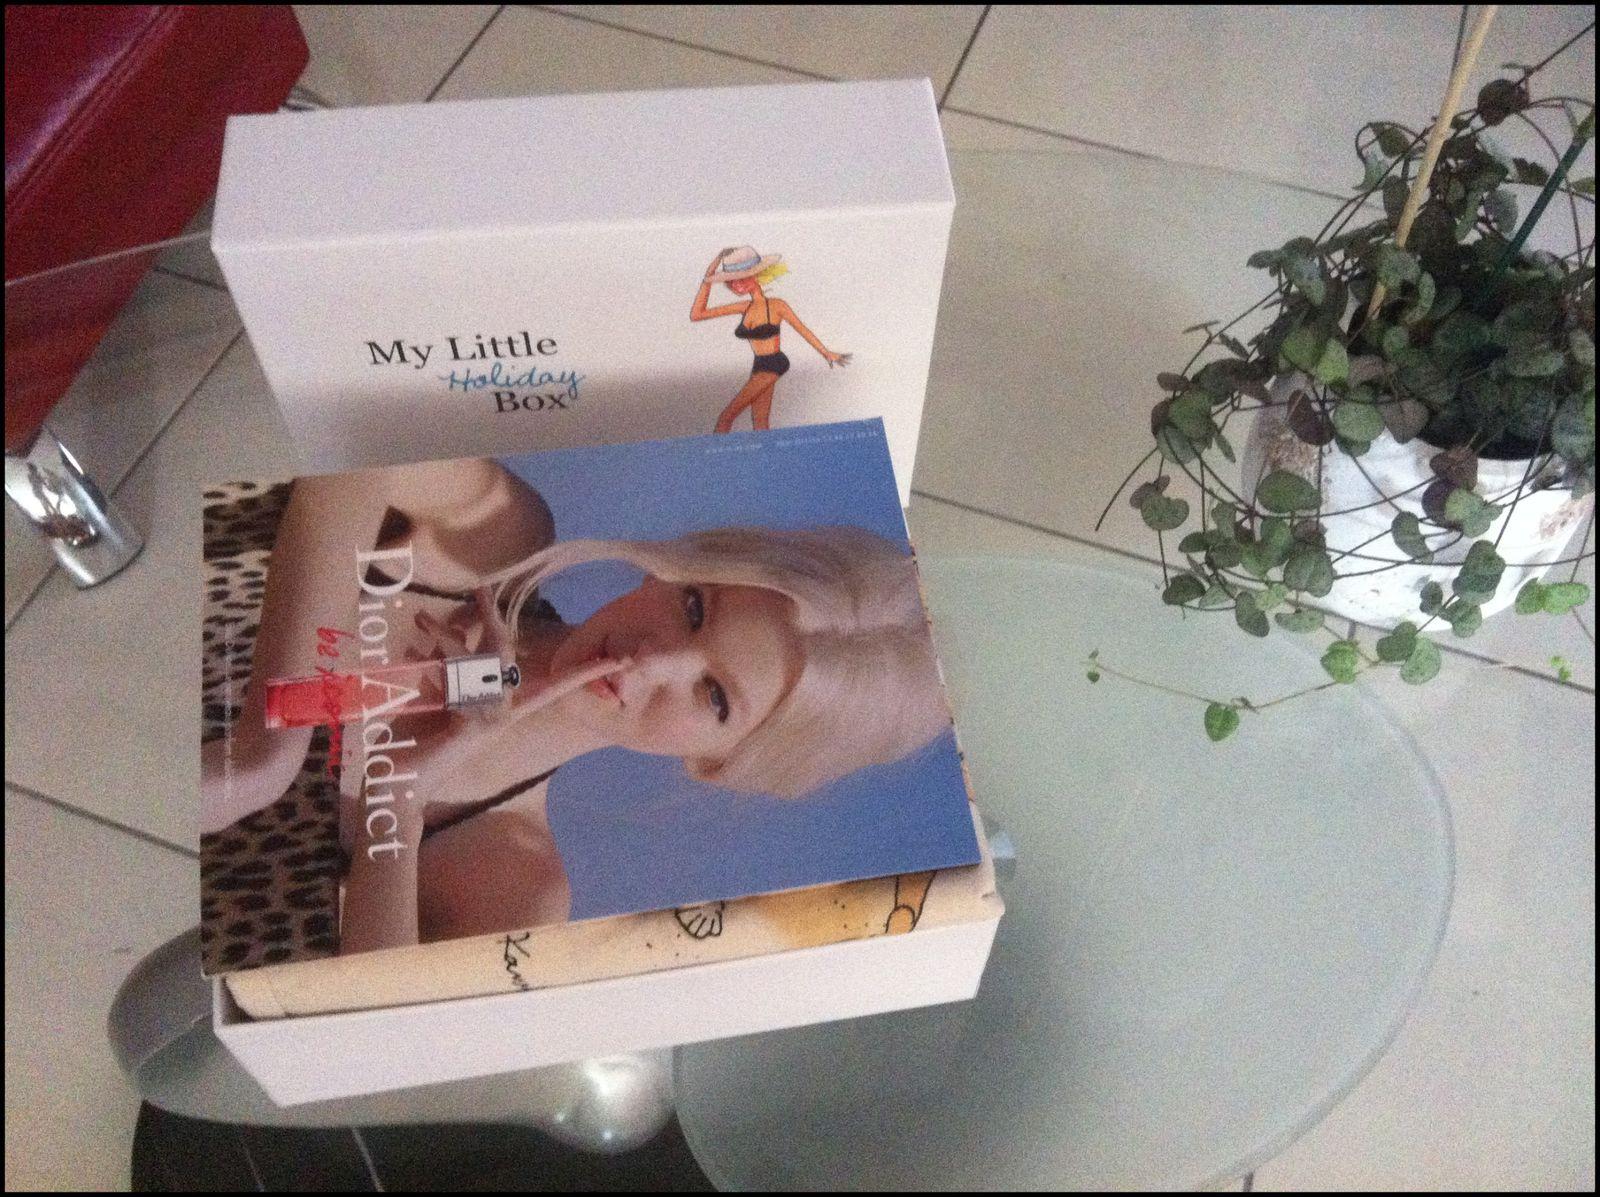 My little box de juillet 2013